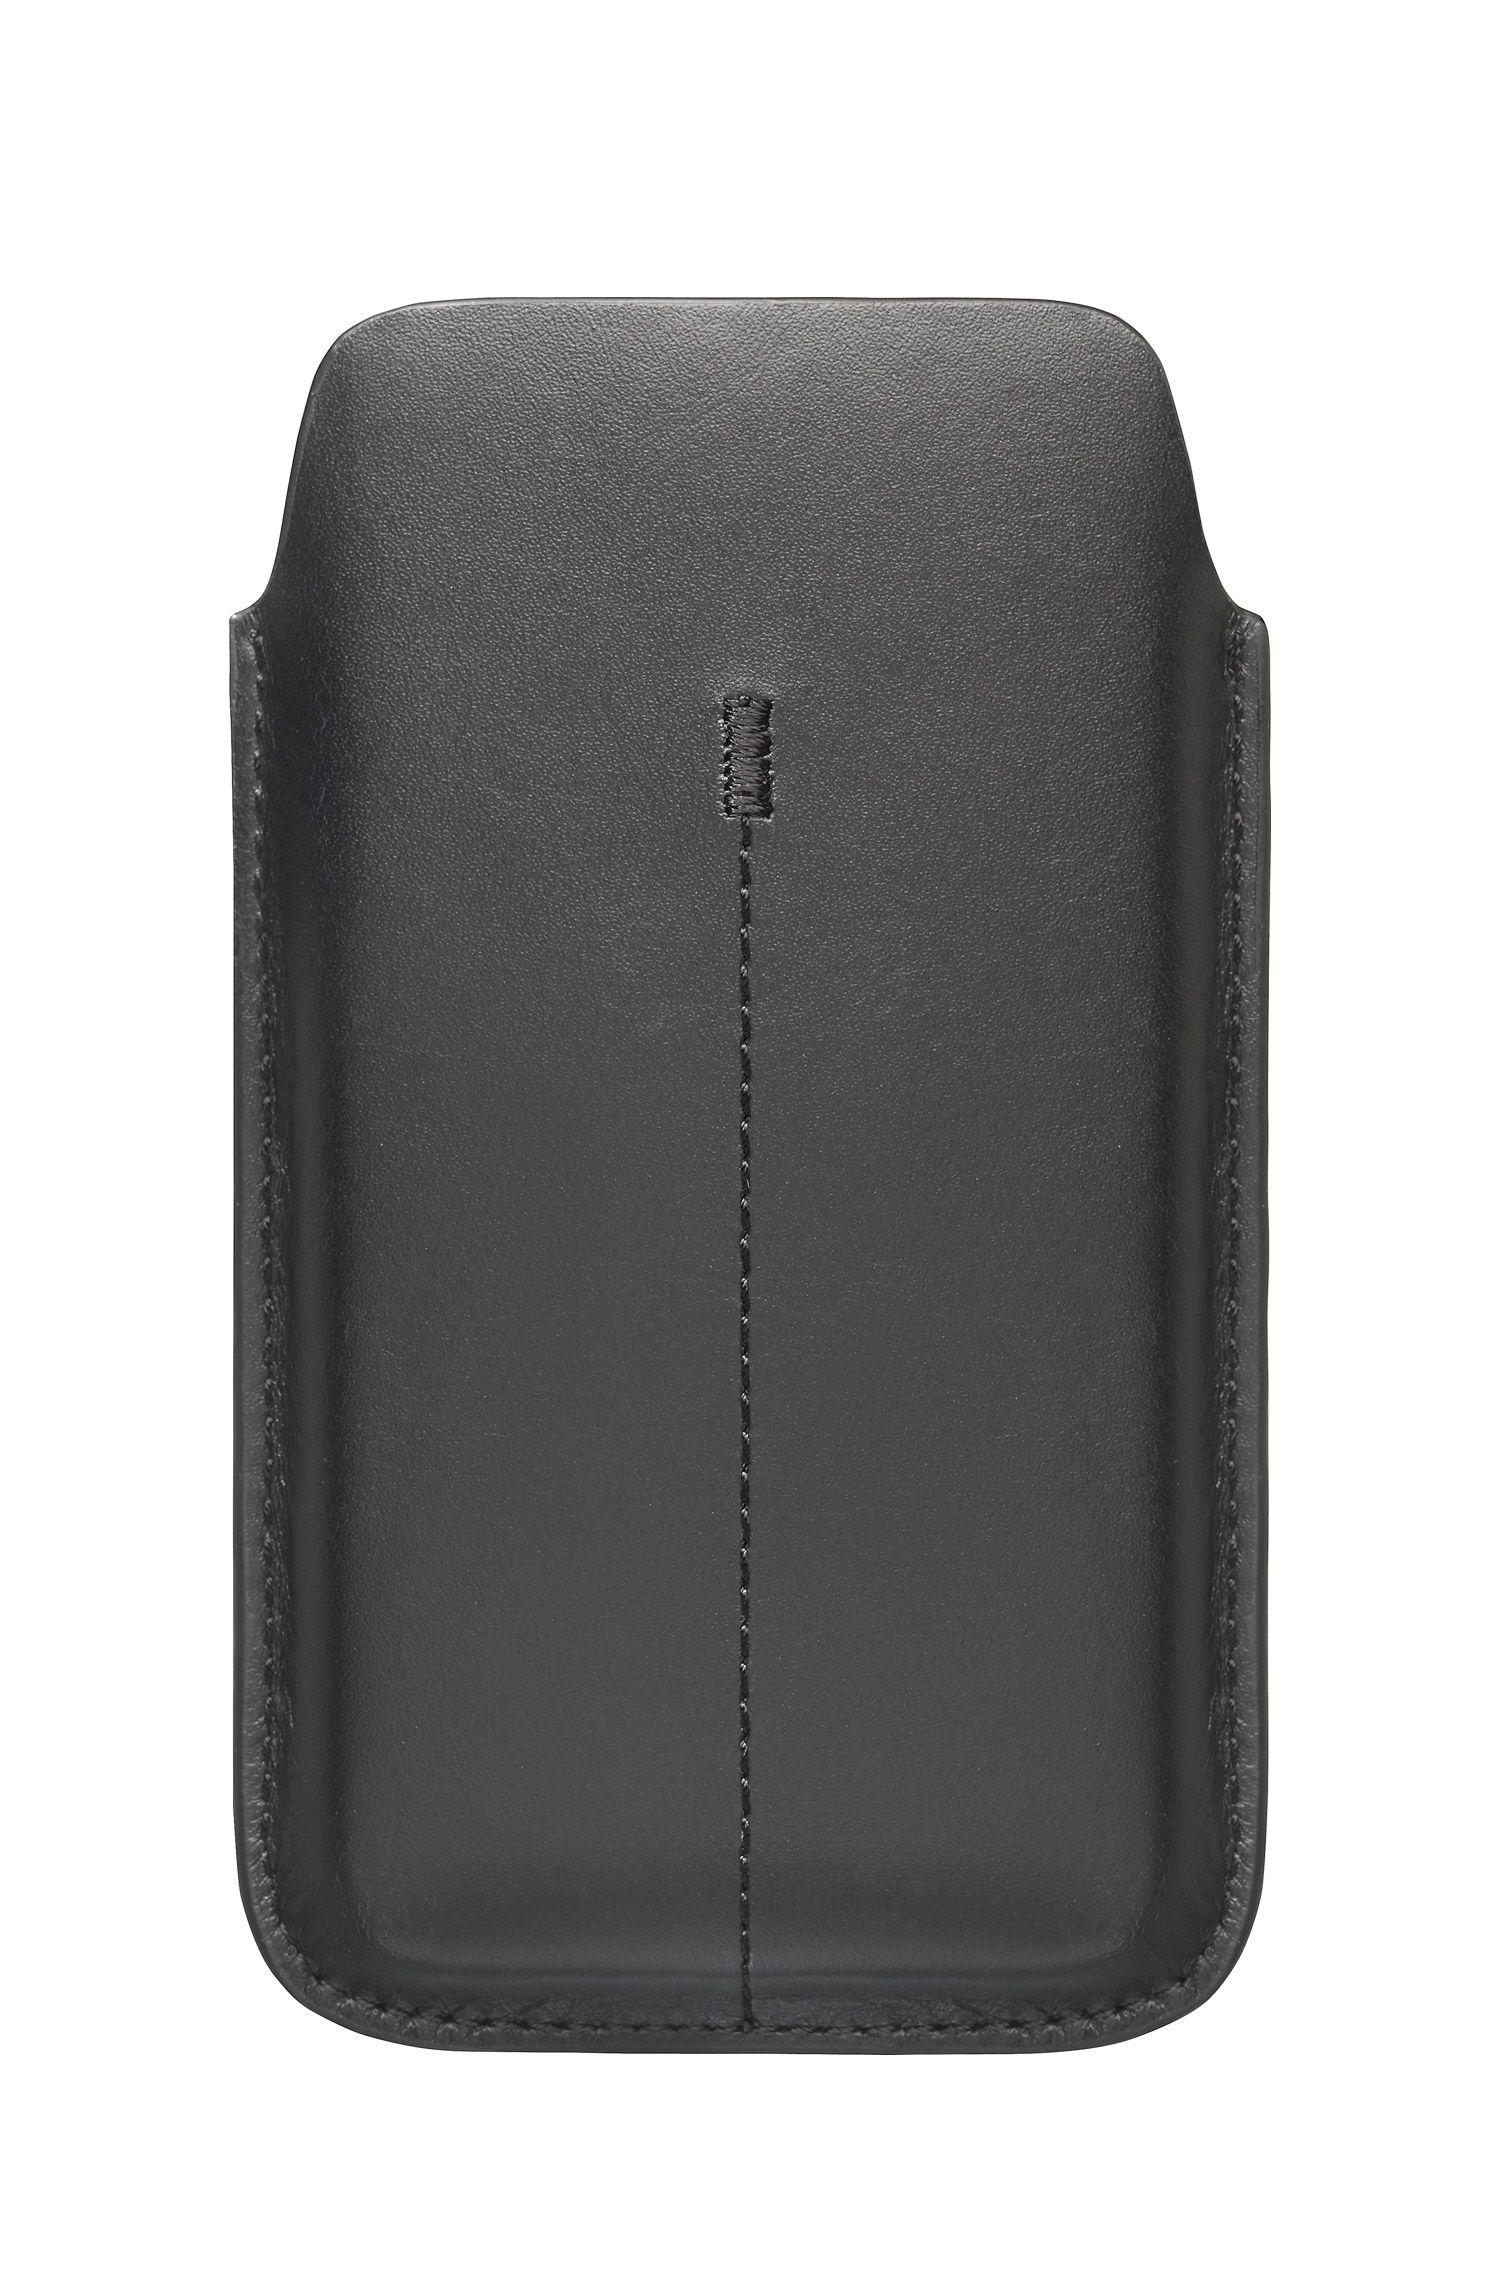 Universaltasche ´BERLIN` für Smartphones